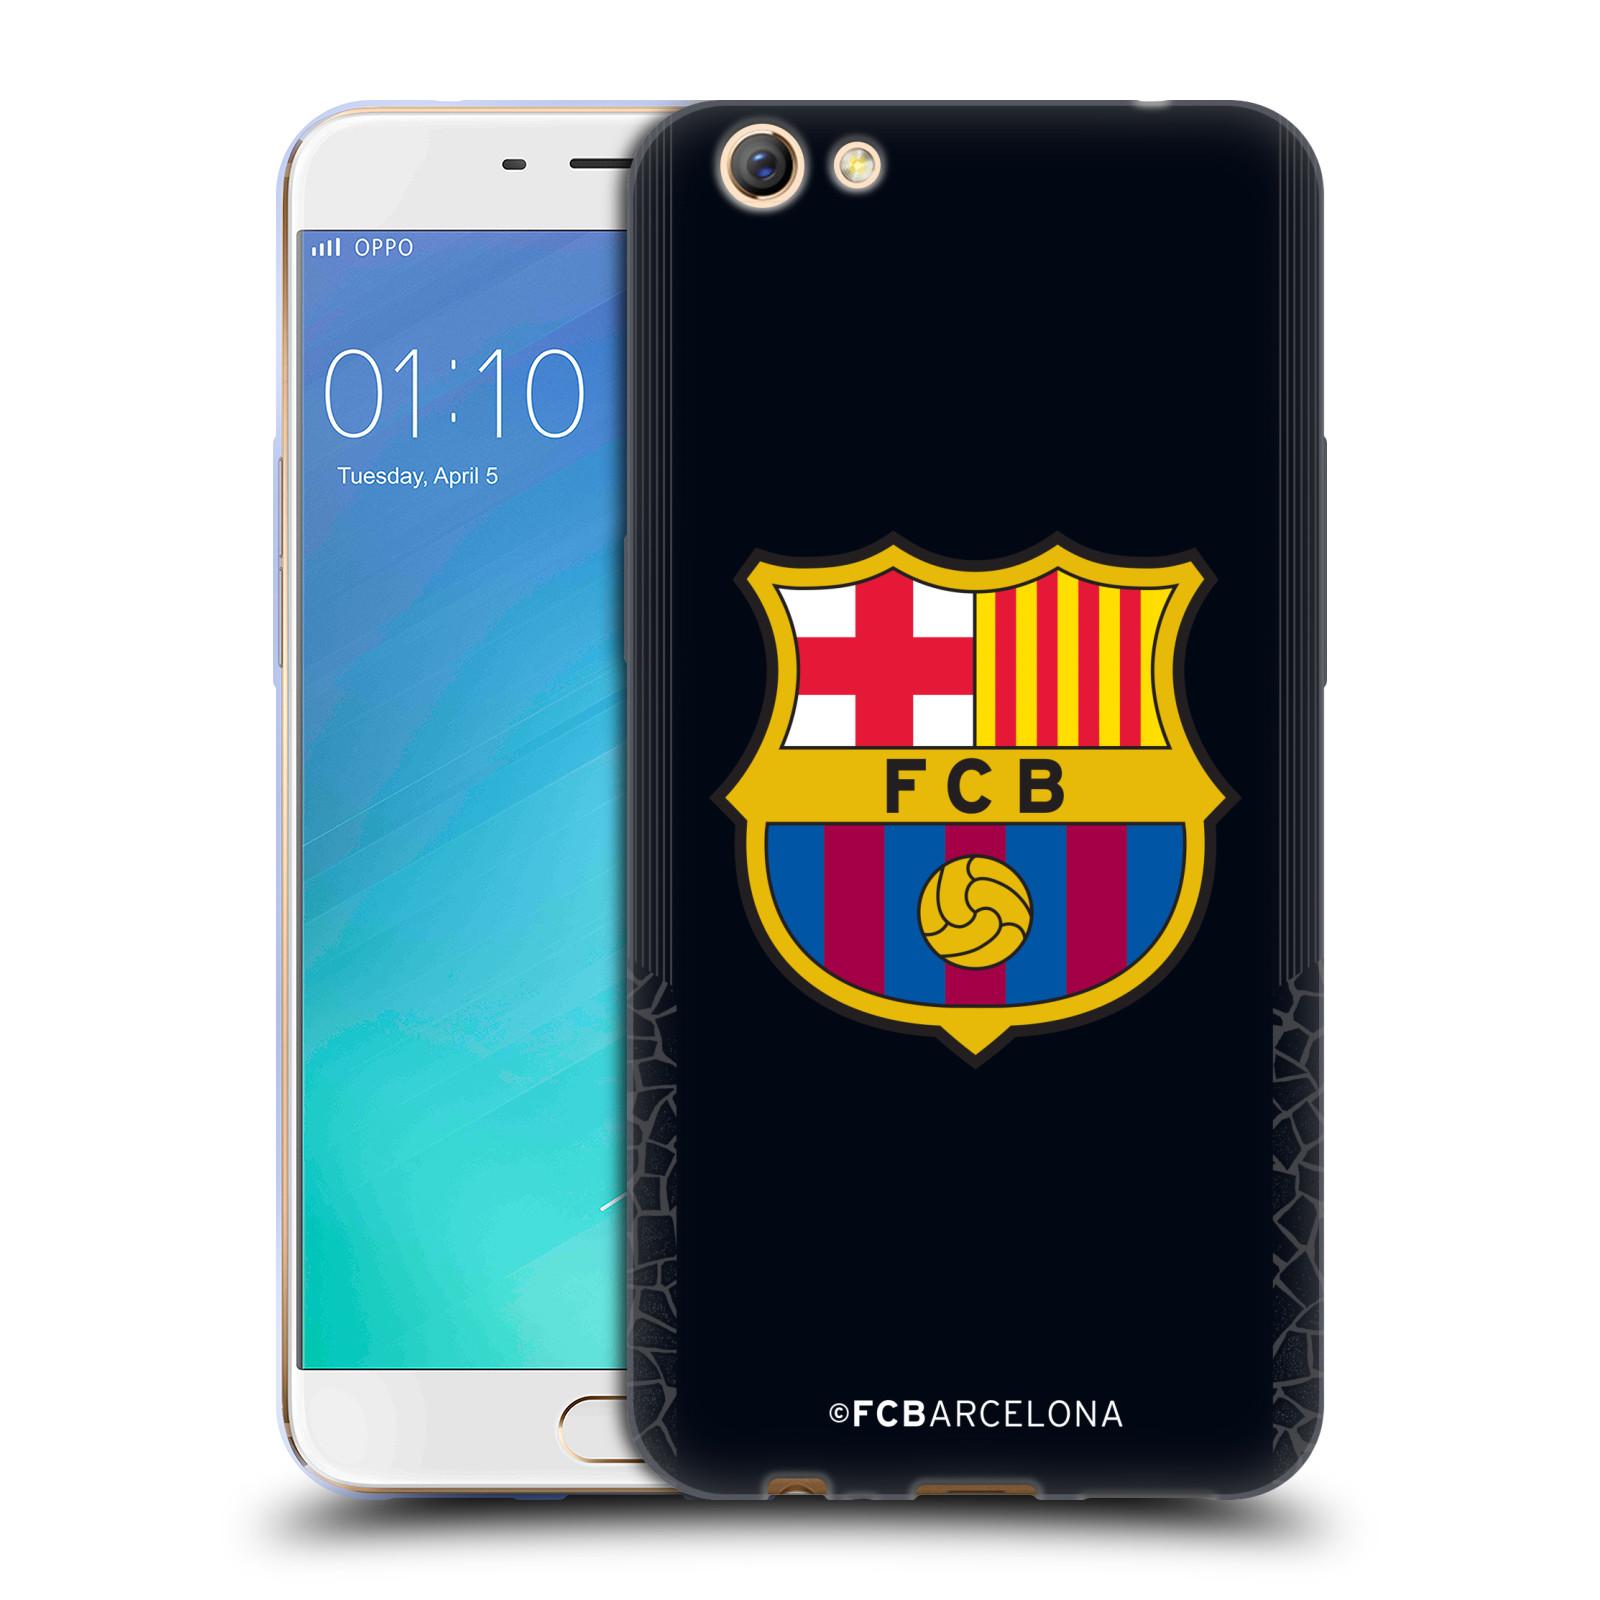 Oficial-FC-Barcelona-2017-18-Crest-Kit-Gel-Suave-Estuche-Para-Telefonos-OPPO